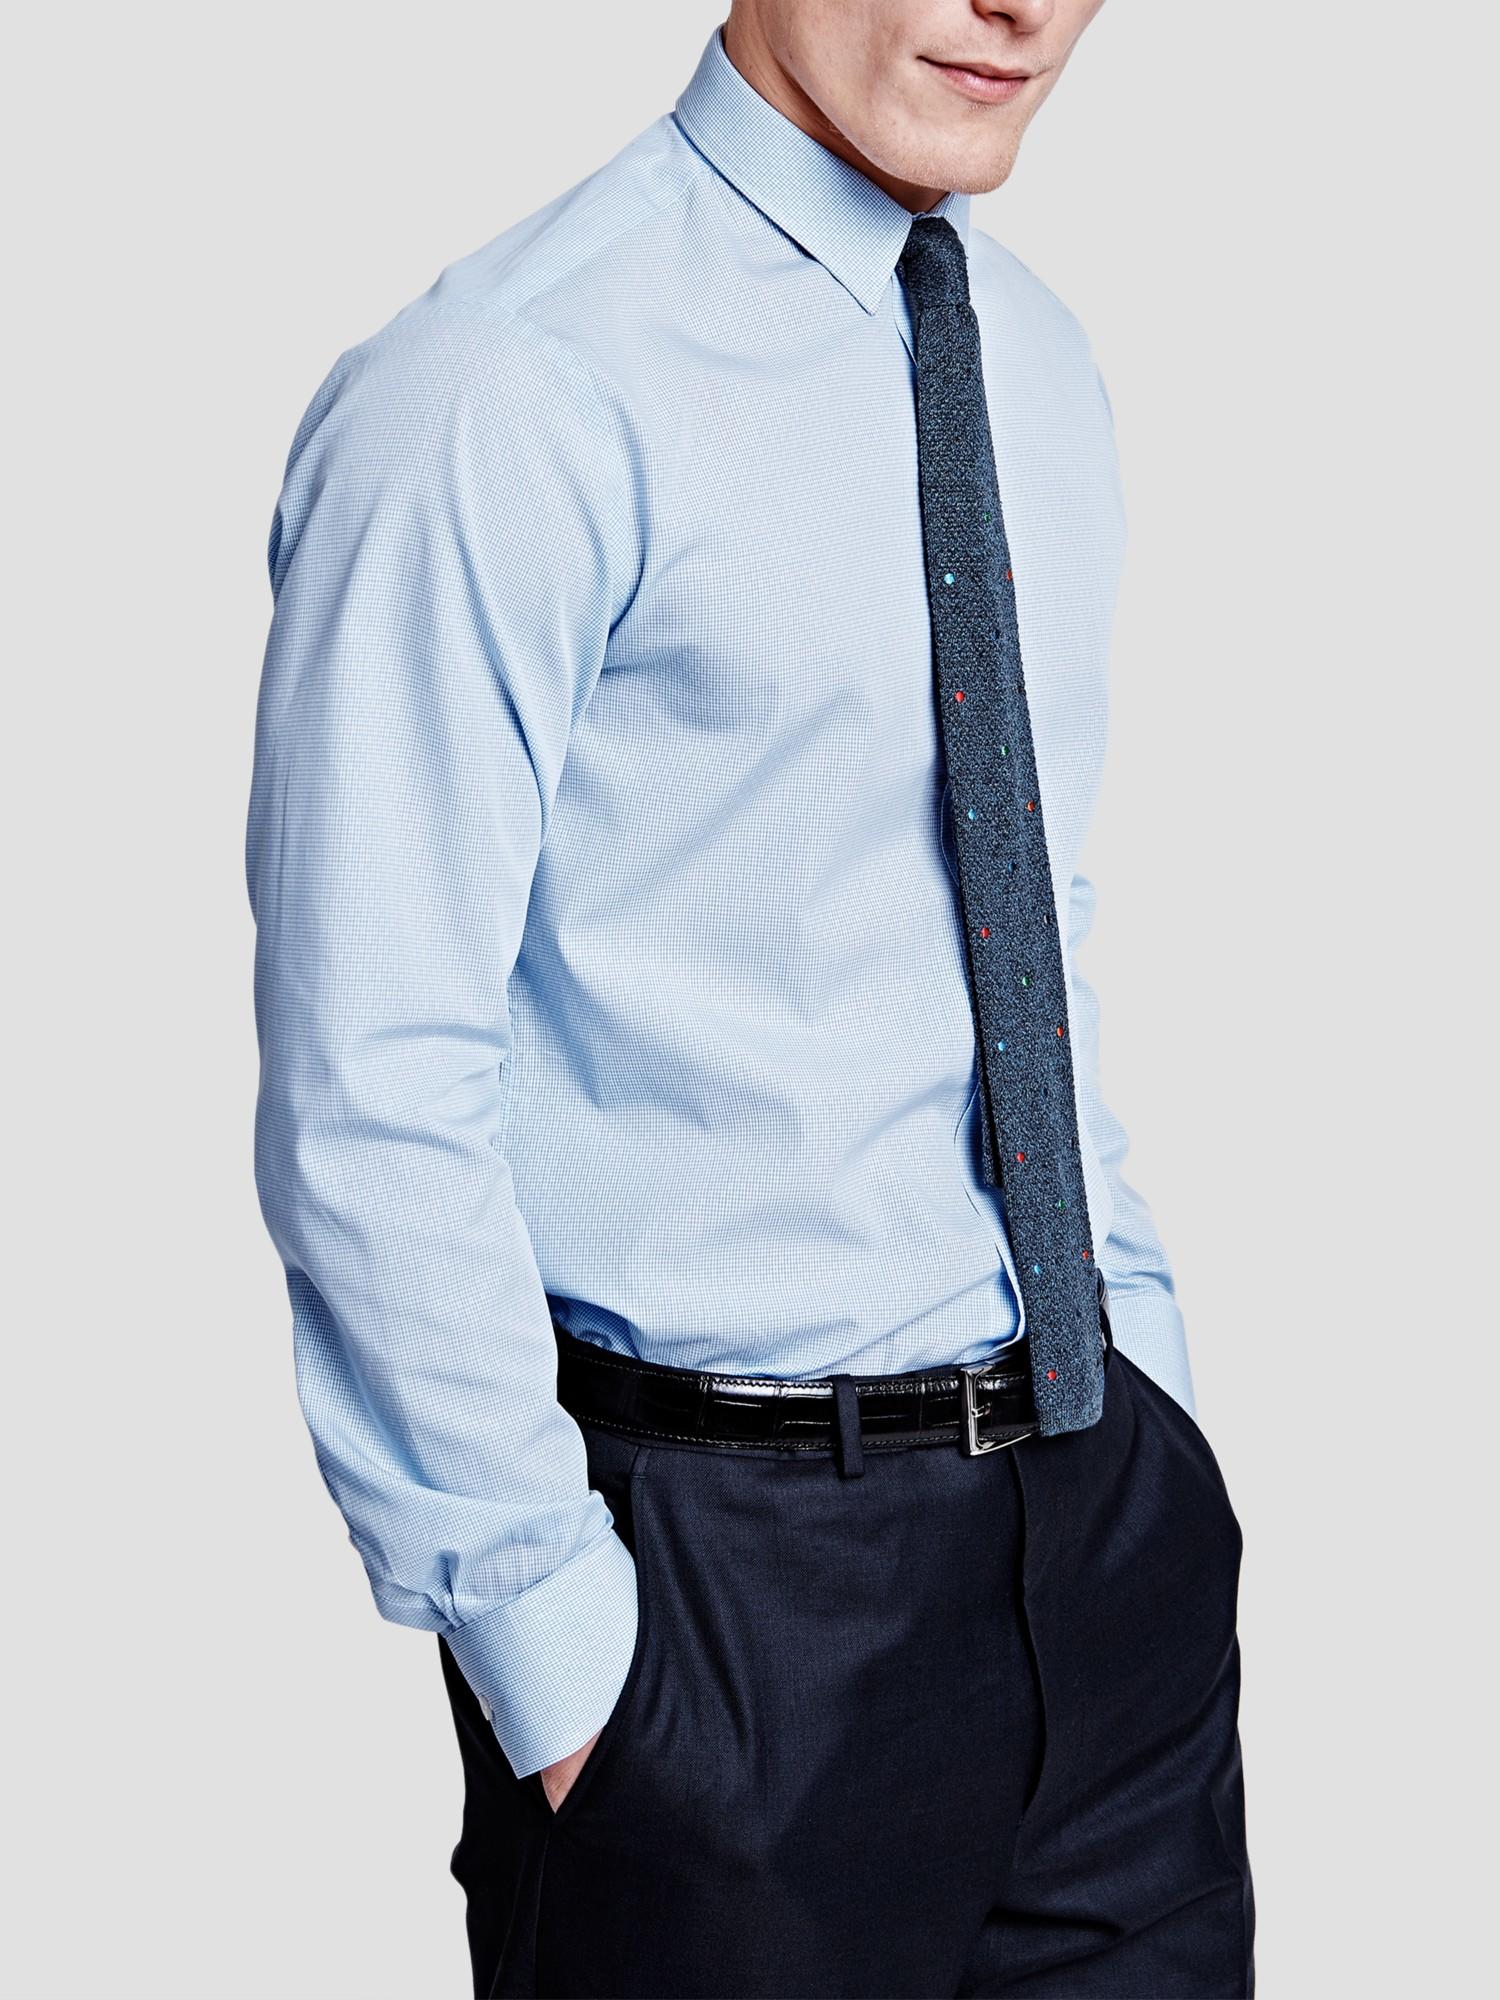 Thomas Pink Cotton Hicks Check Super Slim Shirt in Pale Blue/White (Blue) for Men